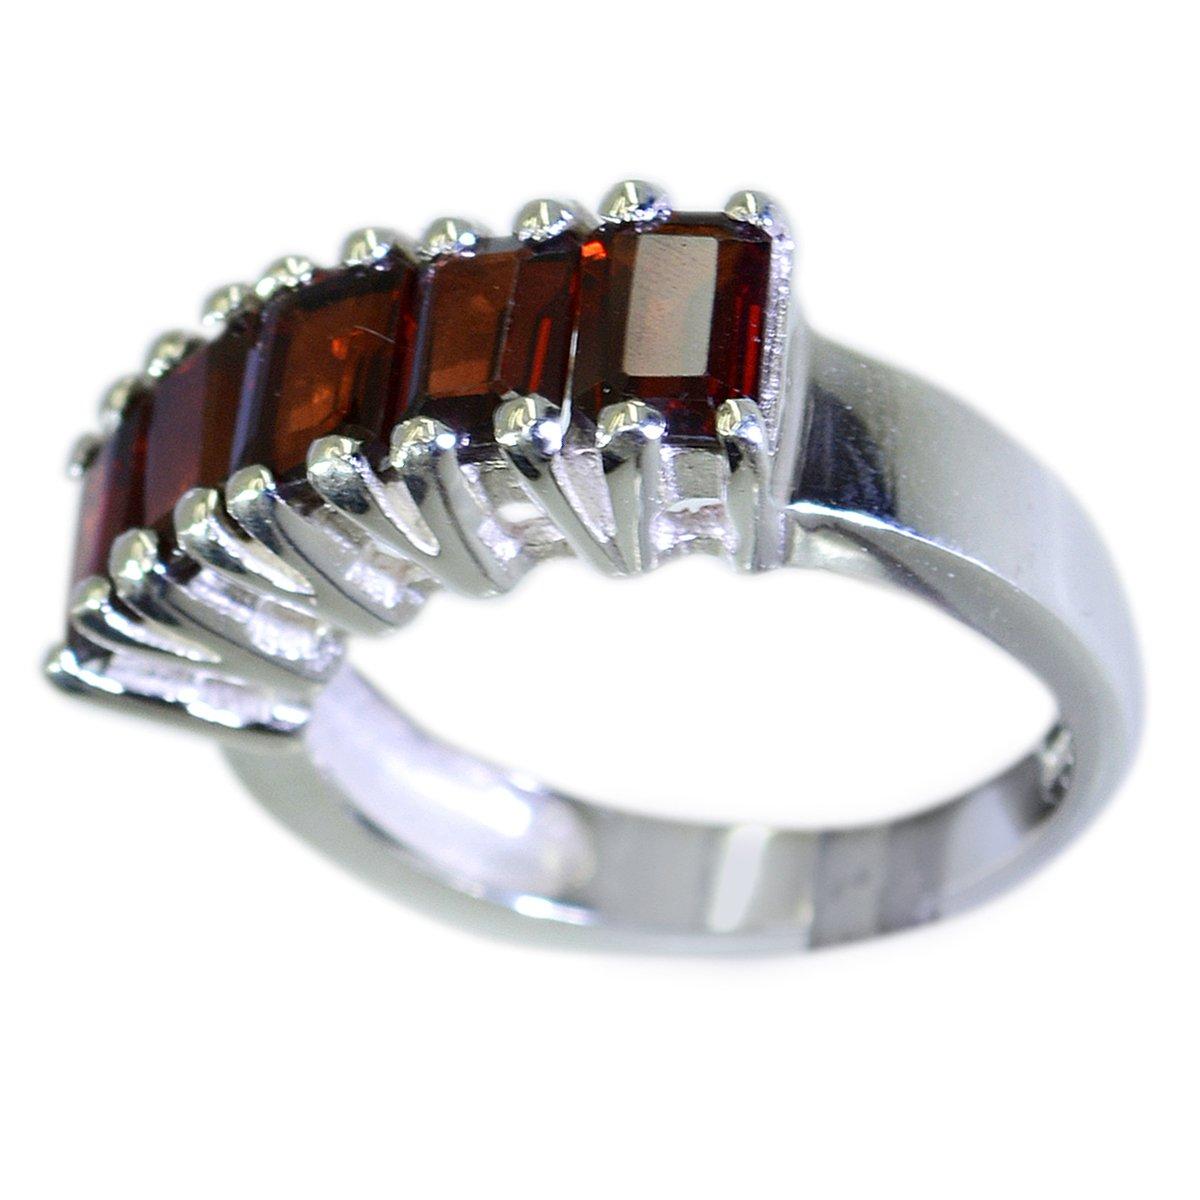 CaratYogi Elegant Fine Garnet Statement Ring in Silver Emerald-Cut Shape Bar Style Jewellery Size 5-12